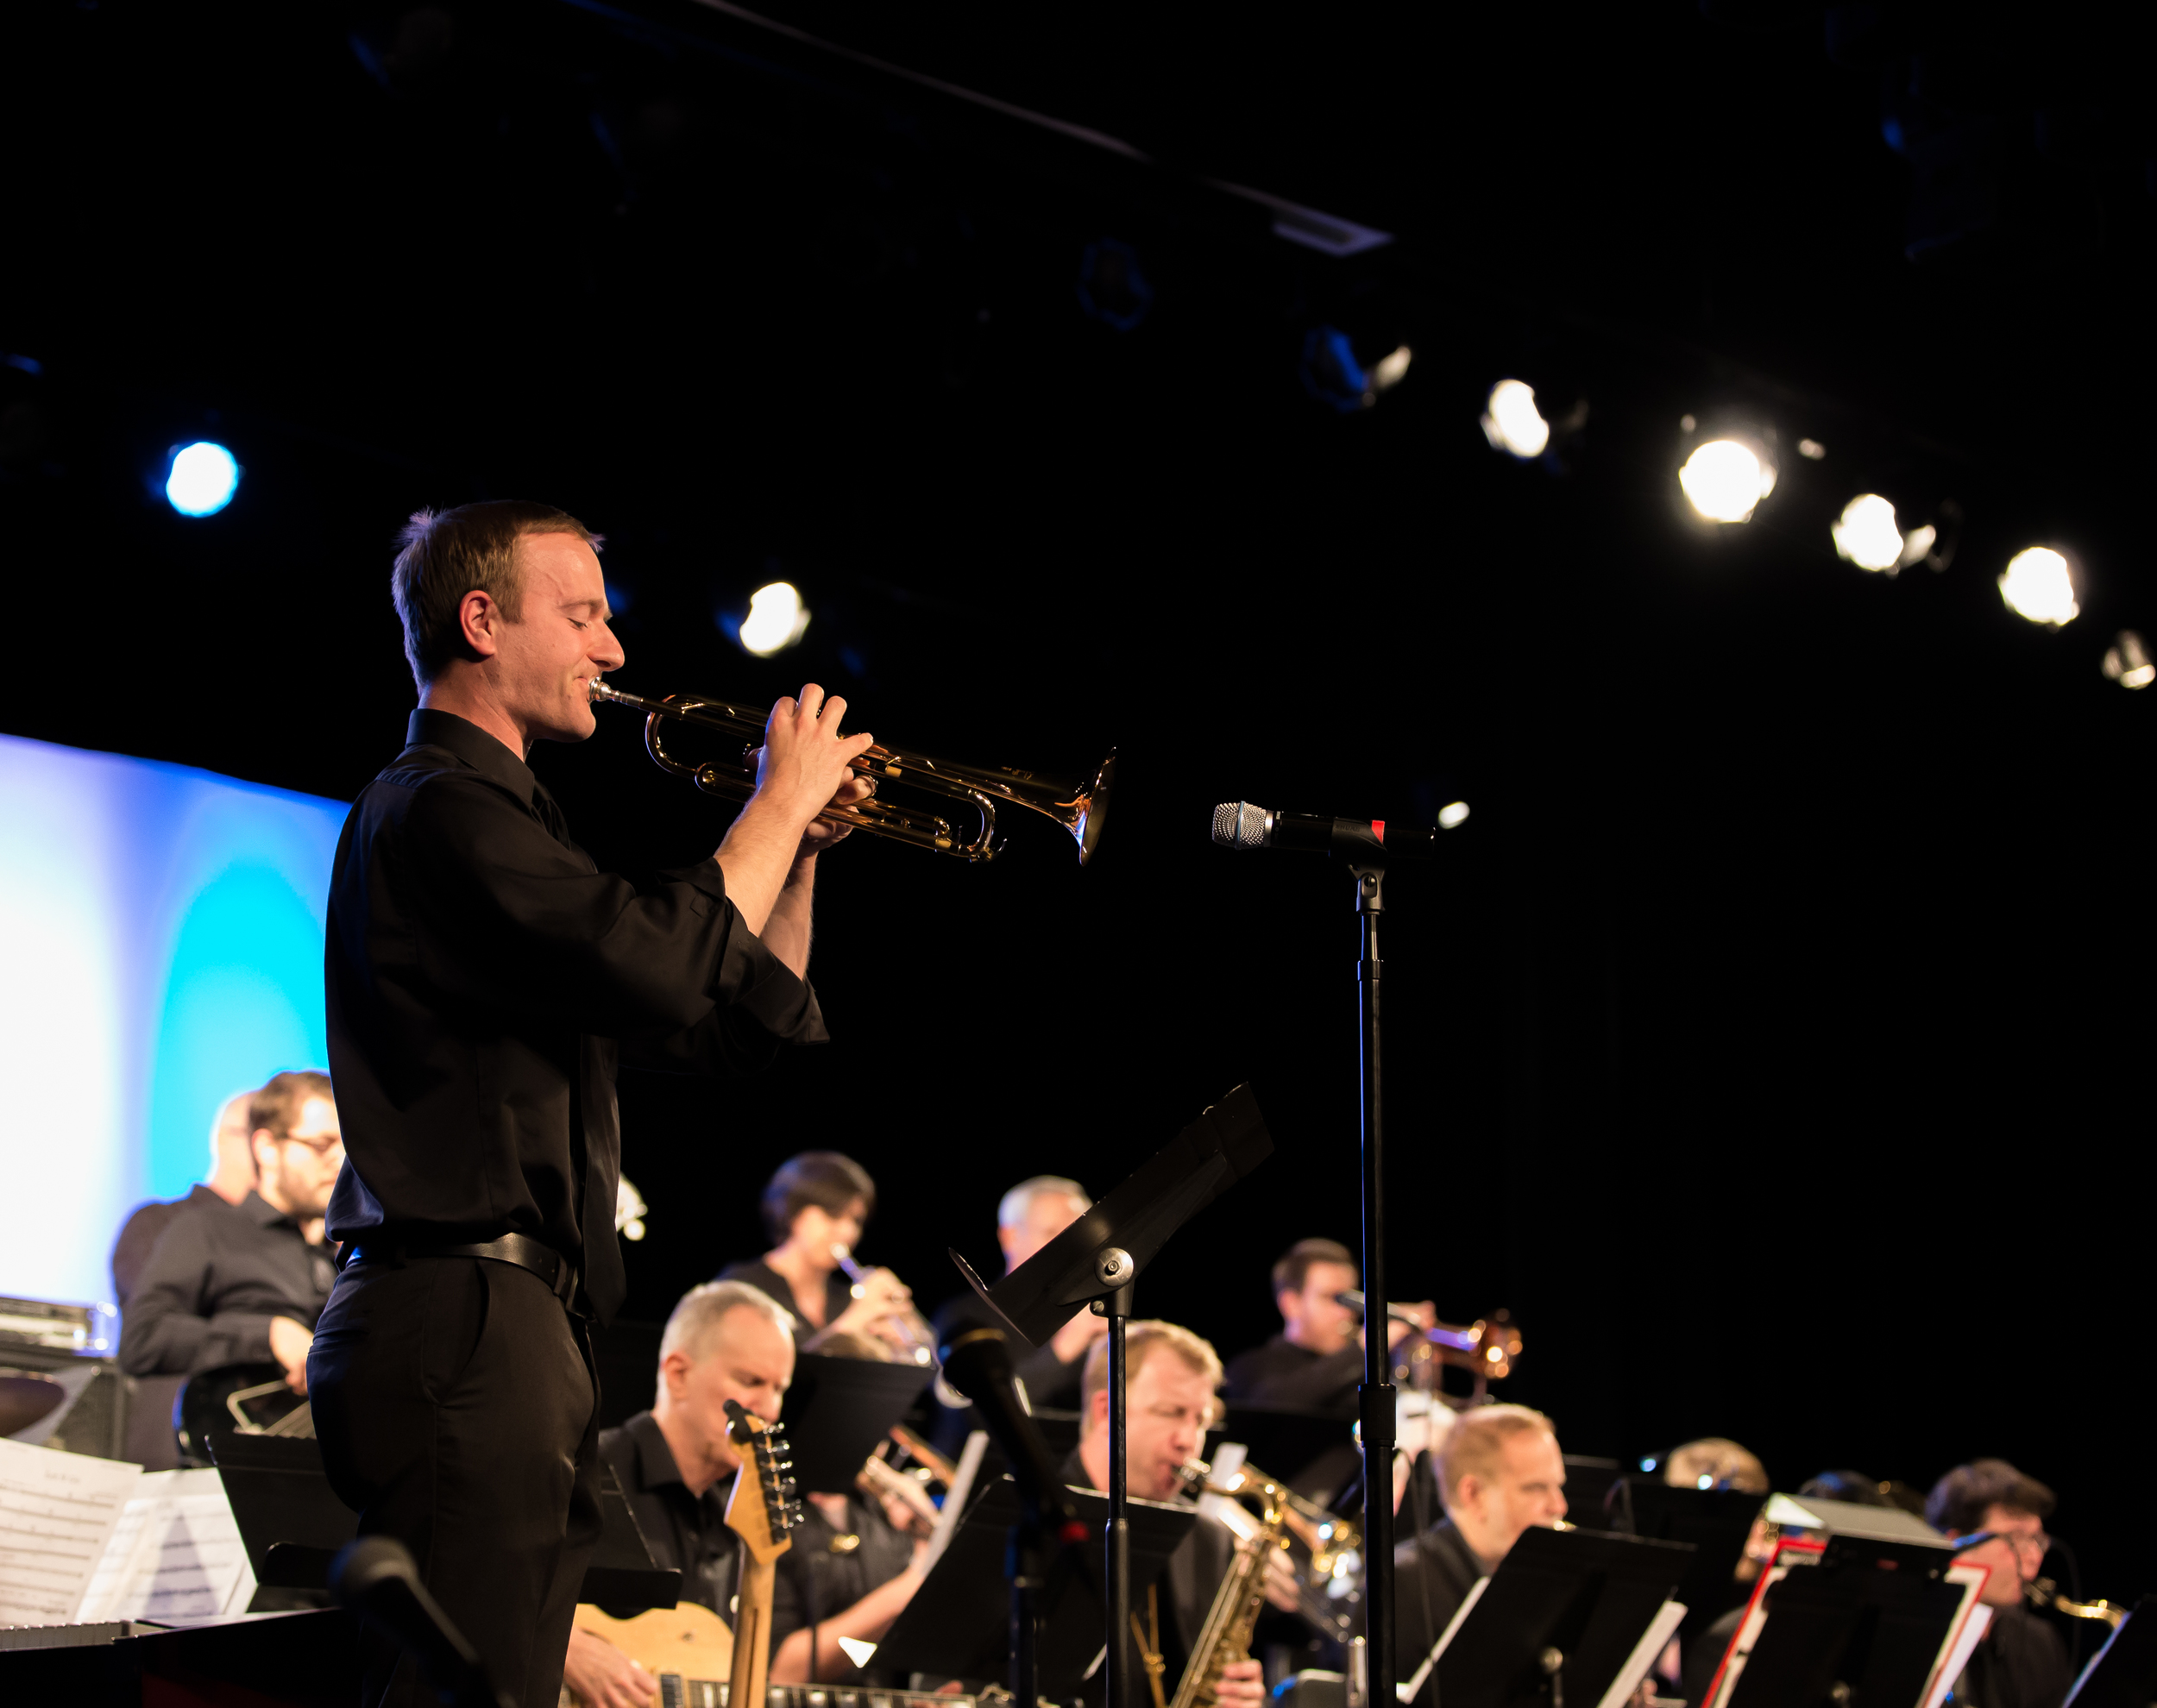 James Blackwell, trumpet